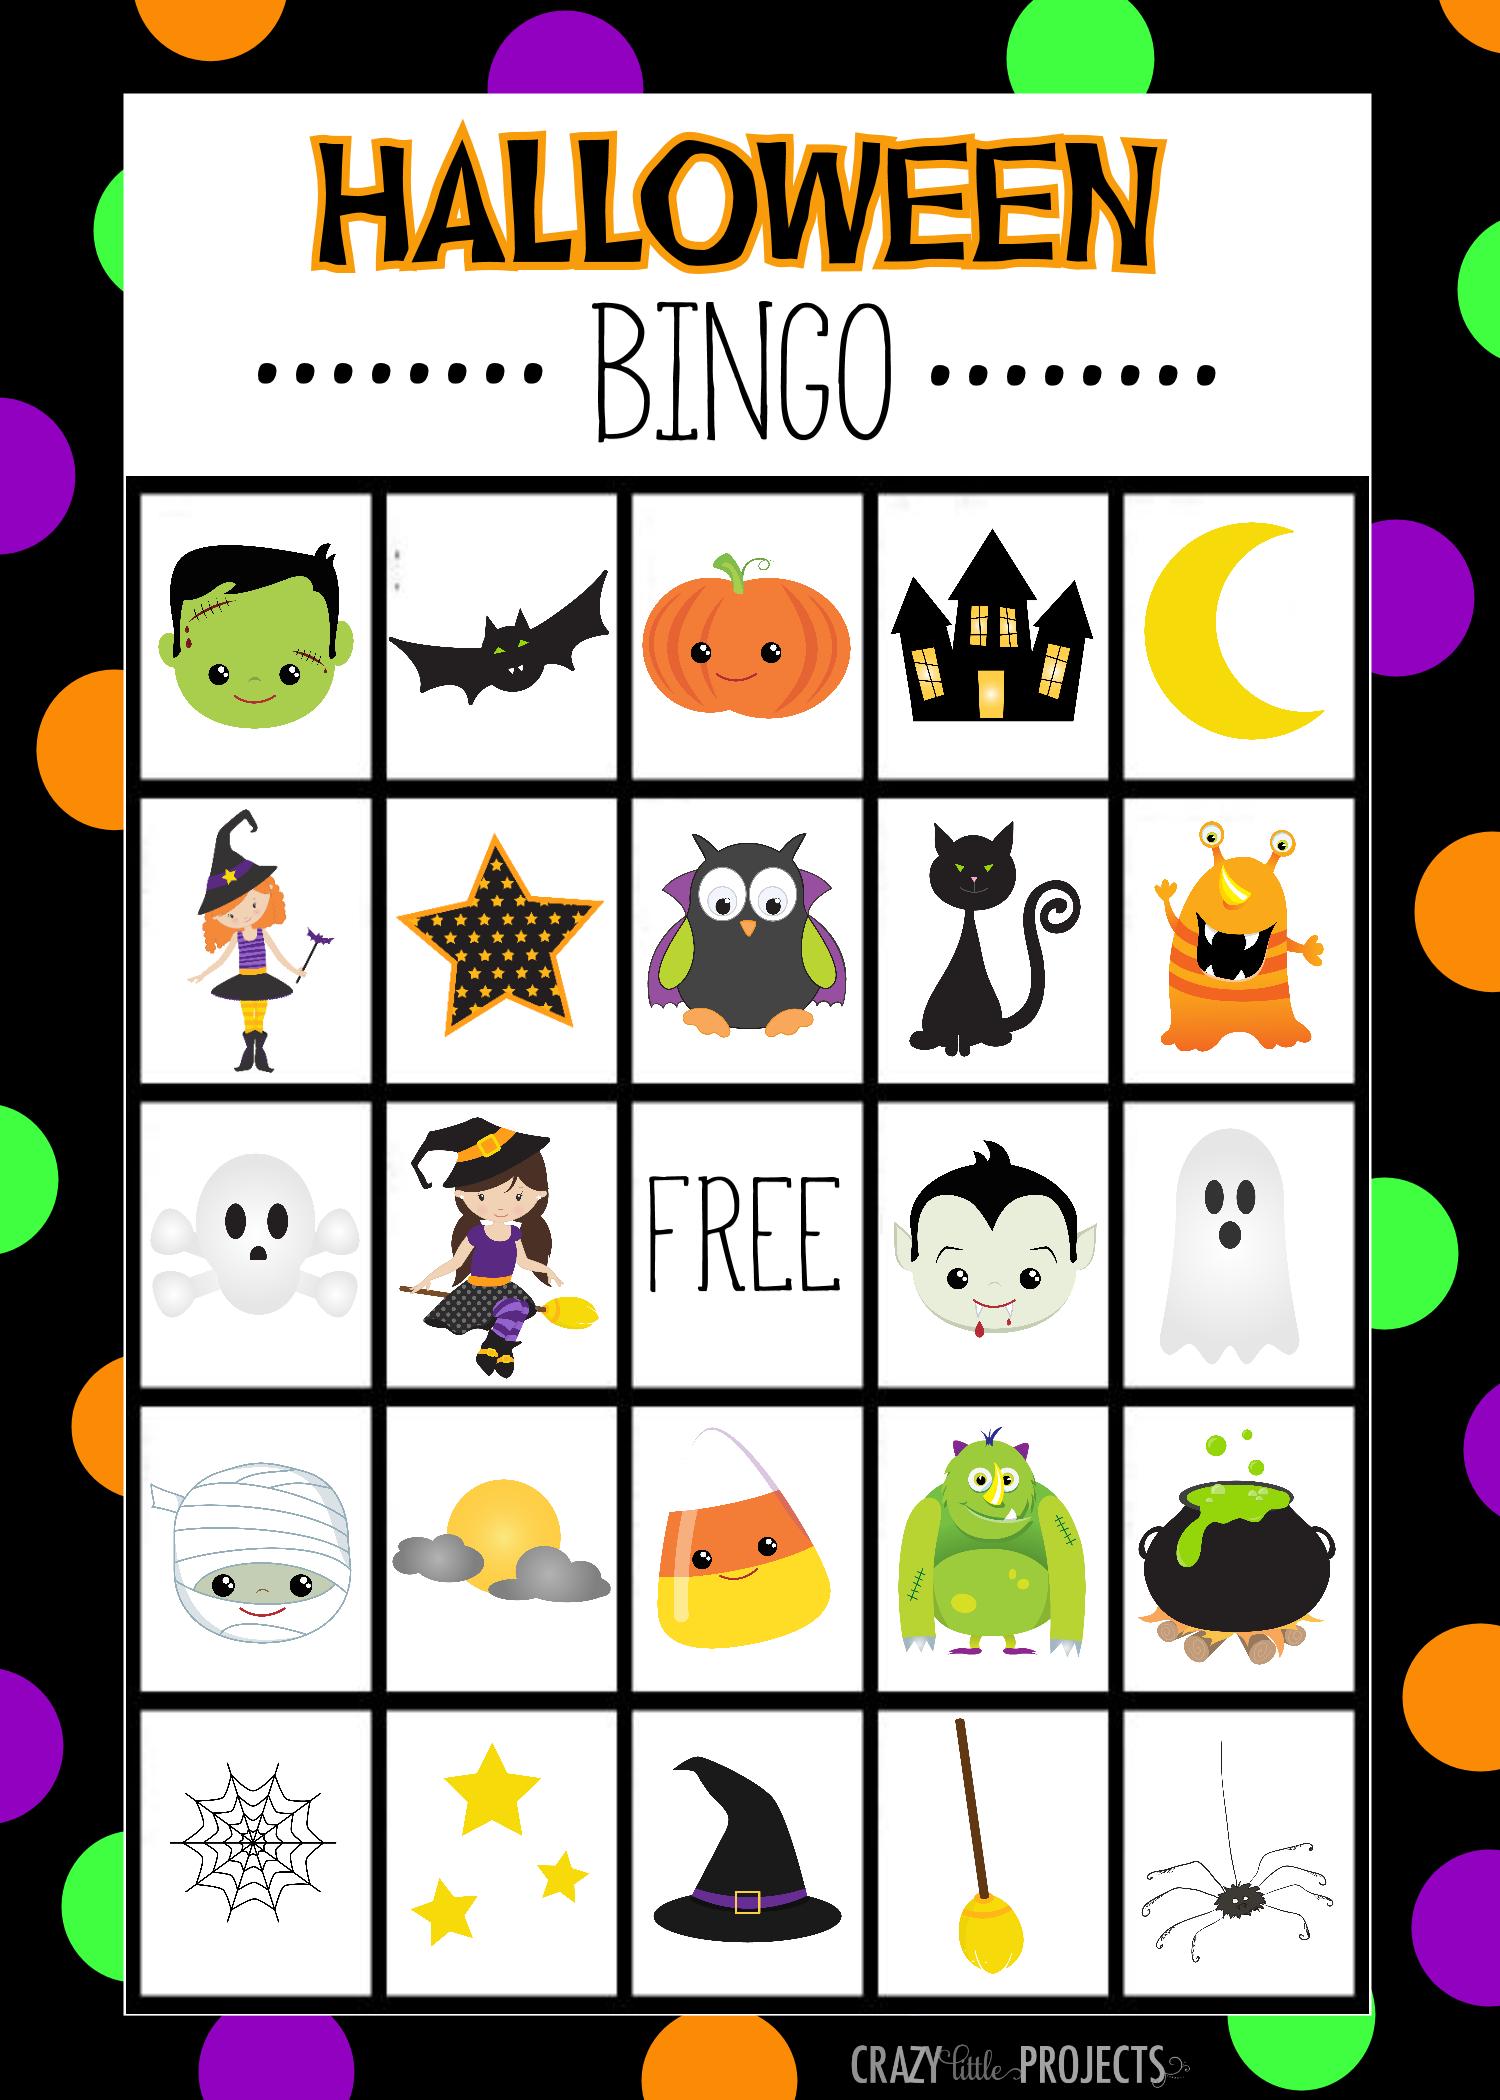 Halloween Bingo - Cute Free Printable Game   Halloween   Pinterest - Free Printable Halloween Party Games